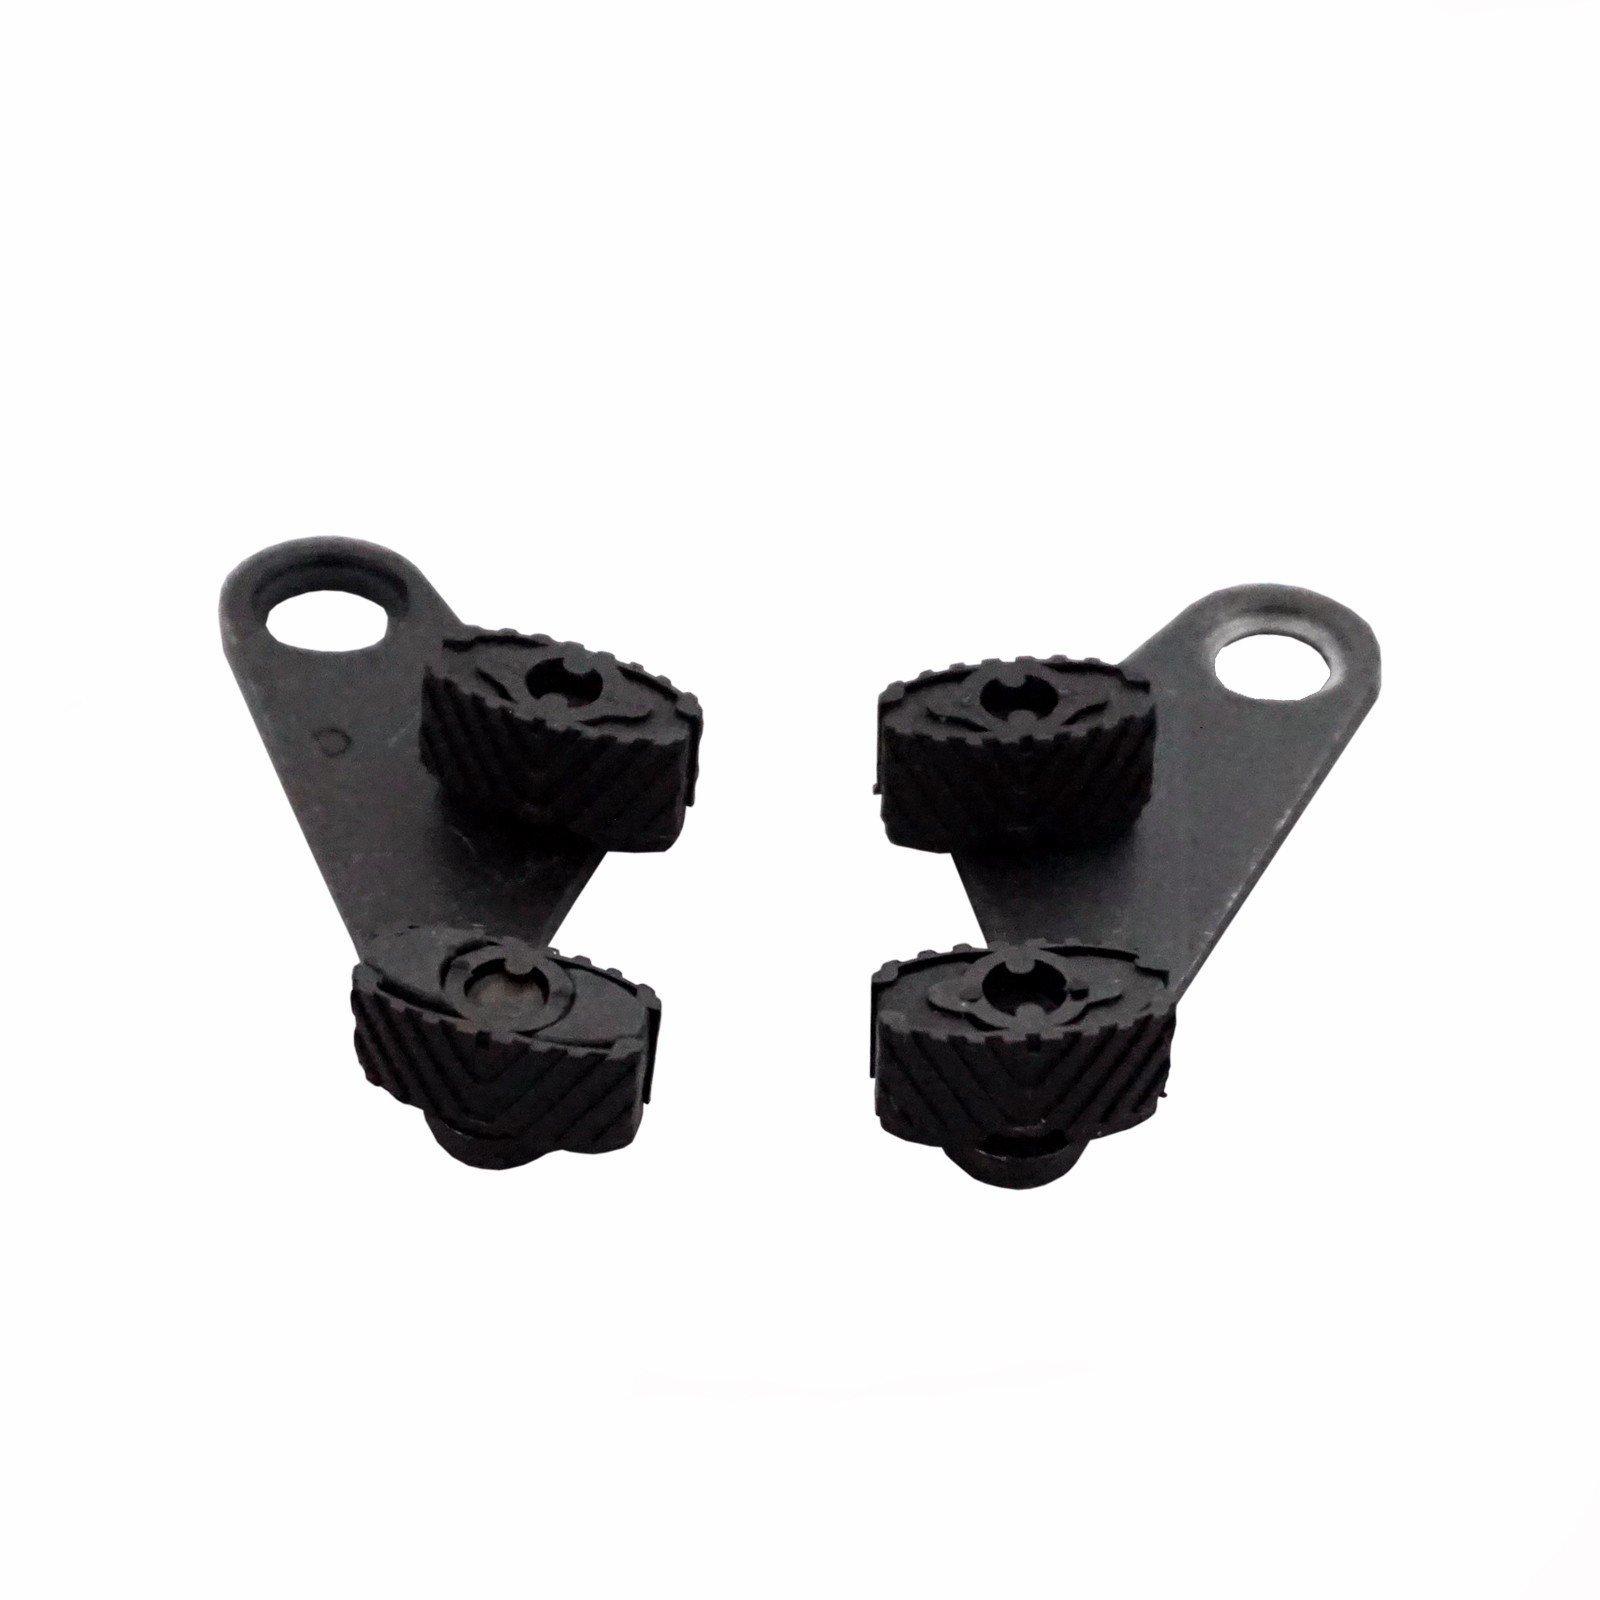 Bross BSR527 Sunroof Sliding System Repair Set:7701209744 for Renault Megane 2 by Bross